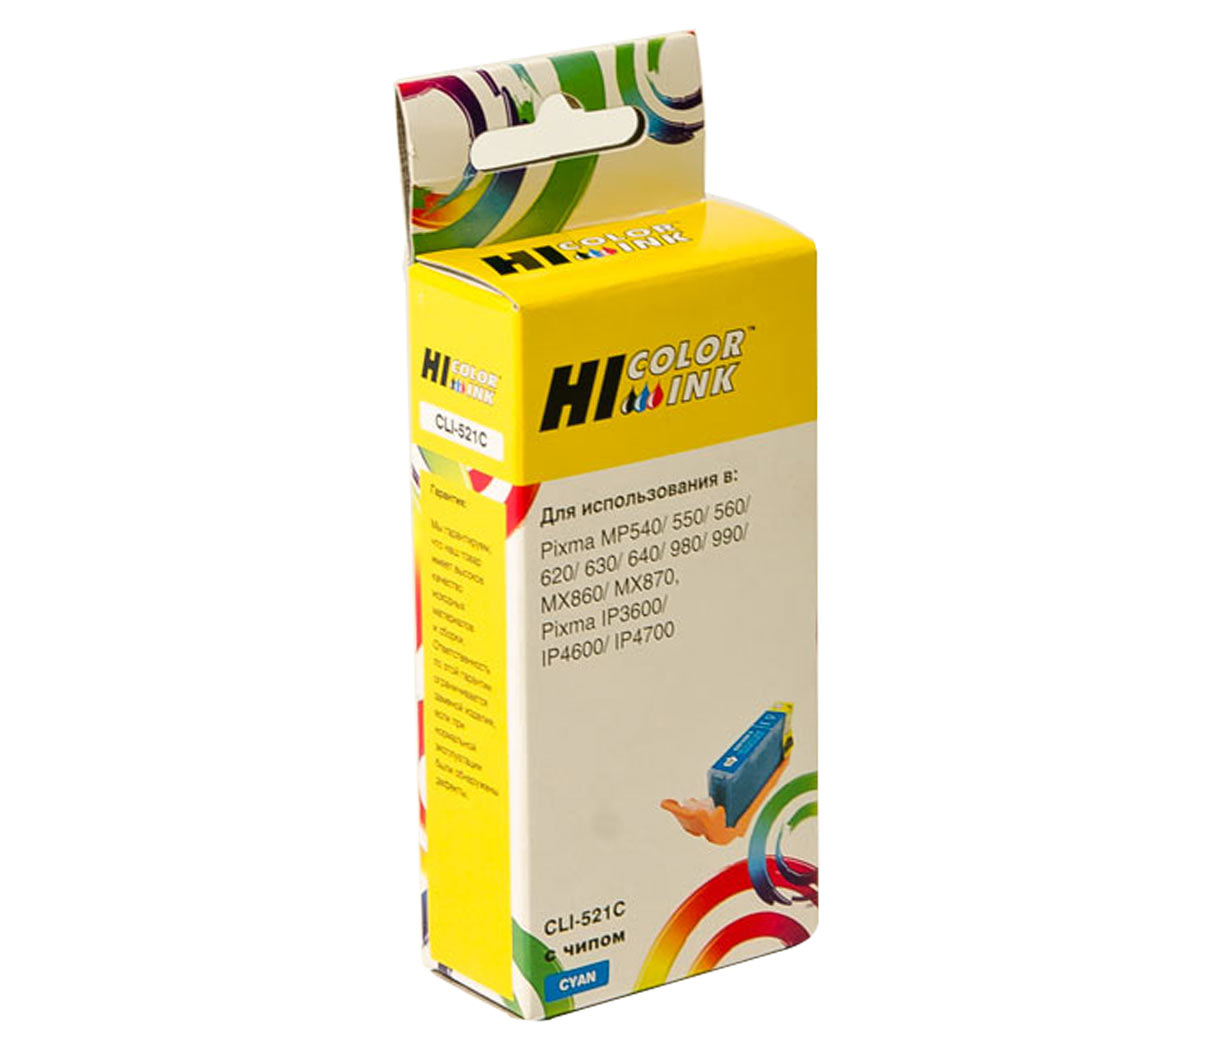 Картридж Hi-Black (HB-CLI-521C) для Canon PIXMA iP3600/iP4600/MP540, C